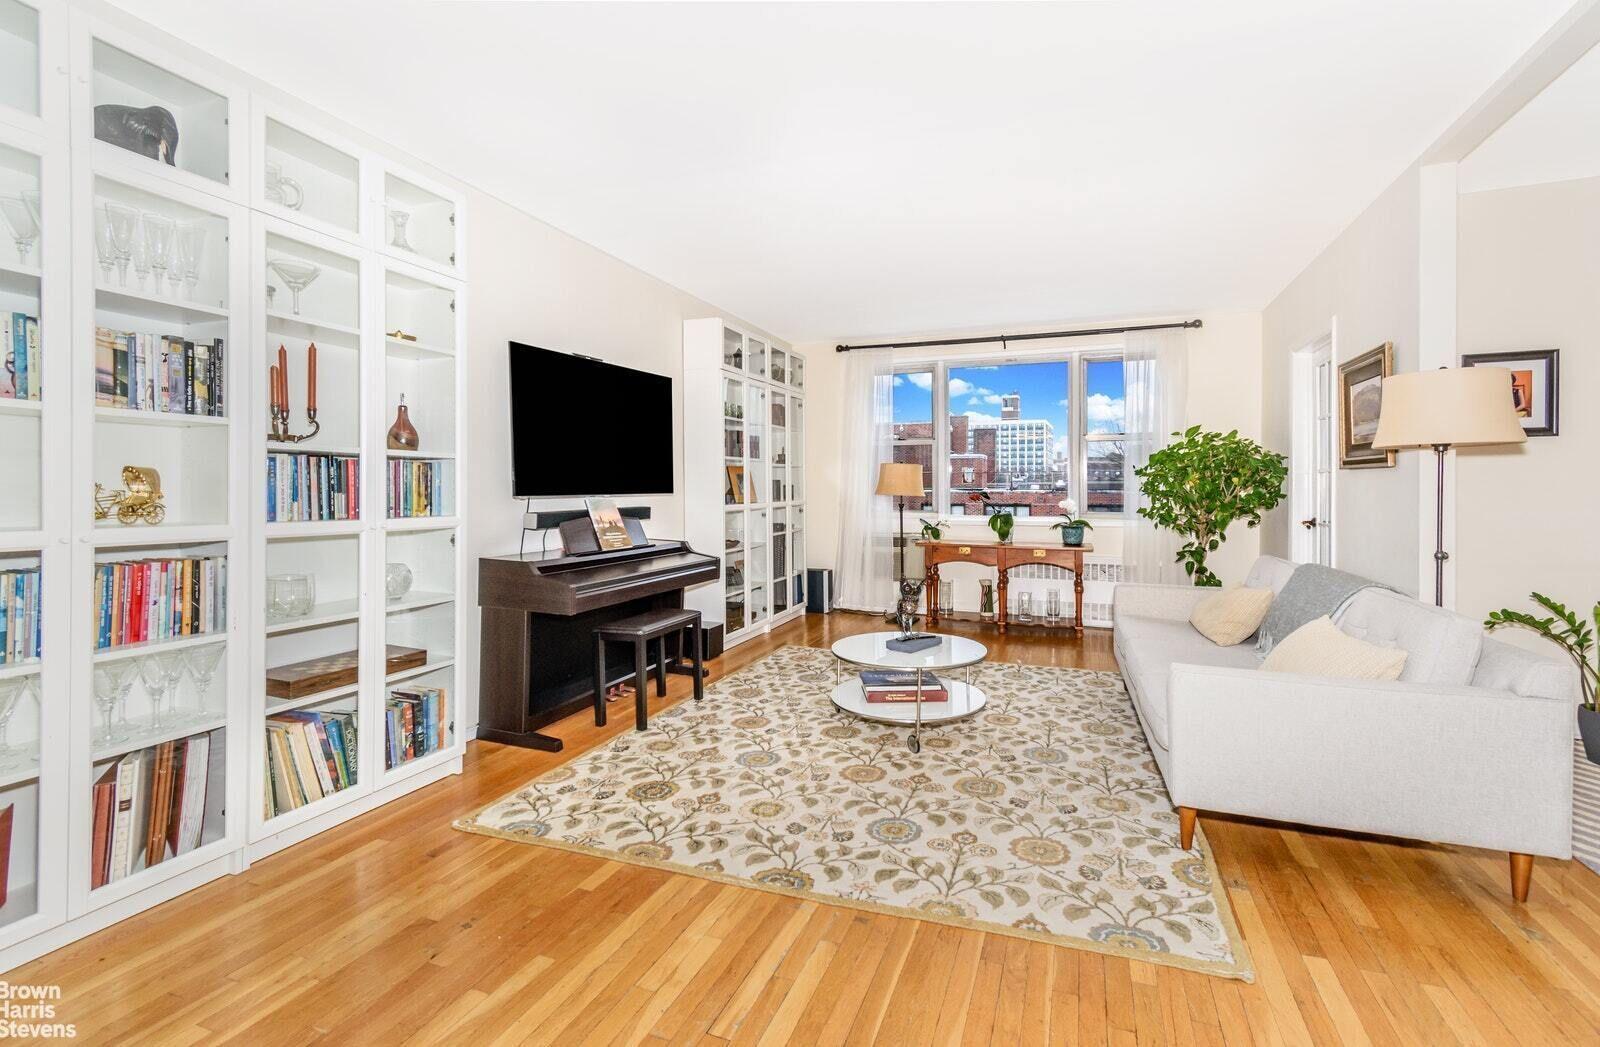 Apartment for sale at 3050 Fairfield Avenue, Apt 5H